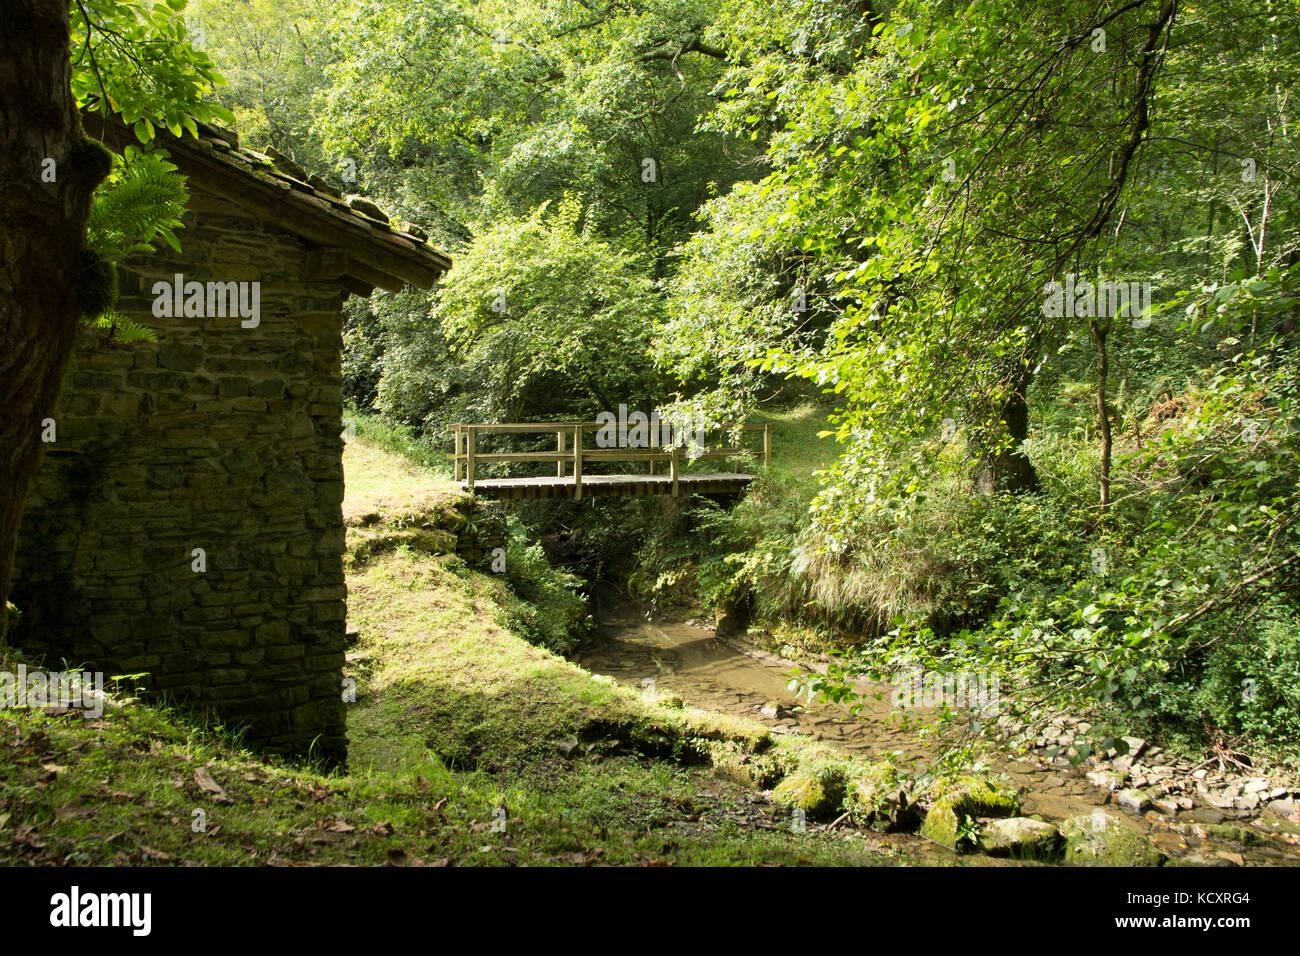 Agorregi's water mill near Pagoeta Natural Park in Guipuzkoa (Euskadi, Spain) - Stock Image